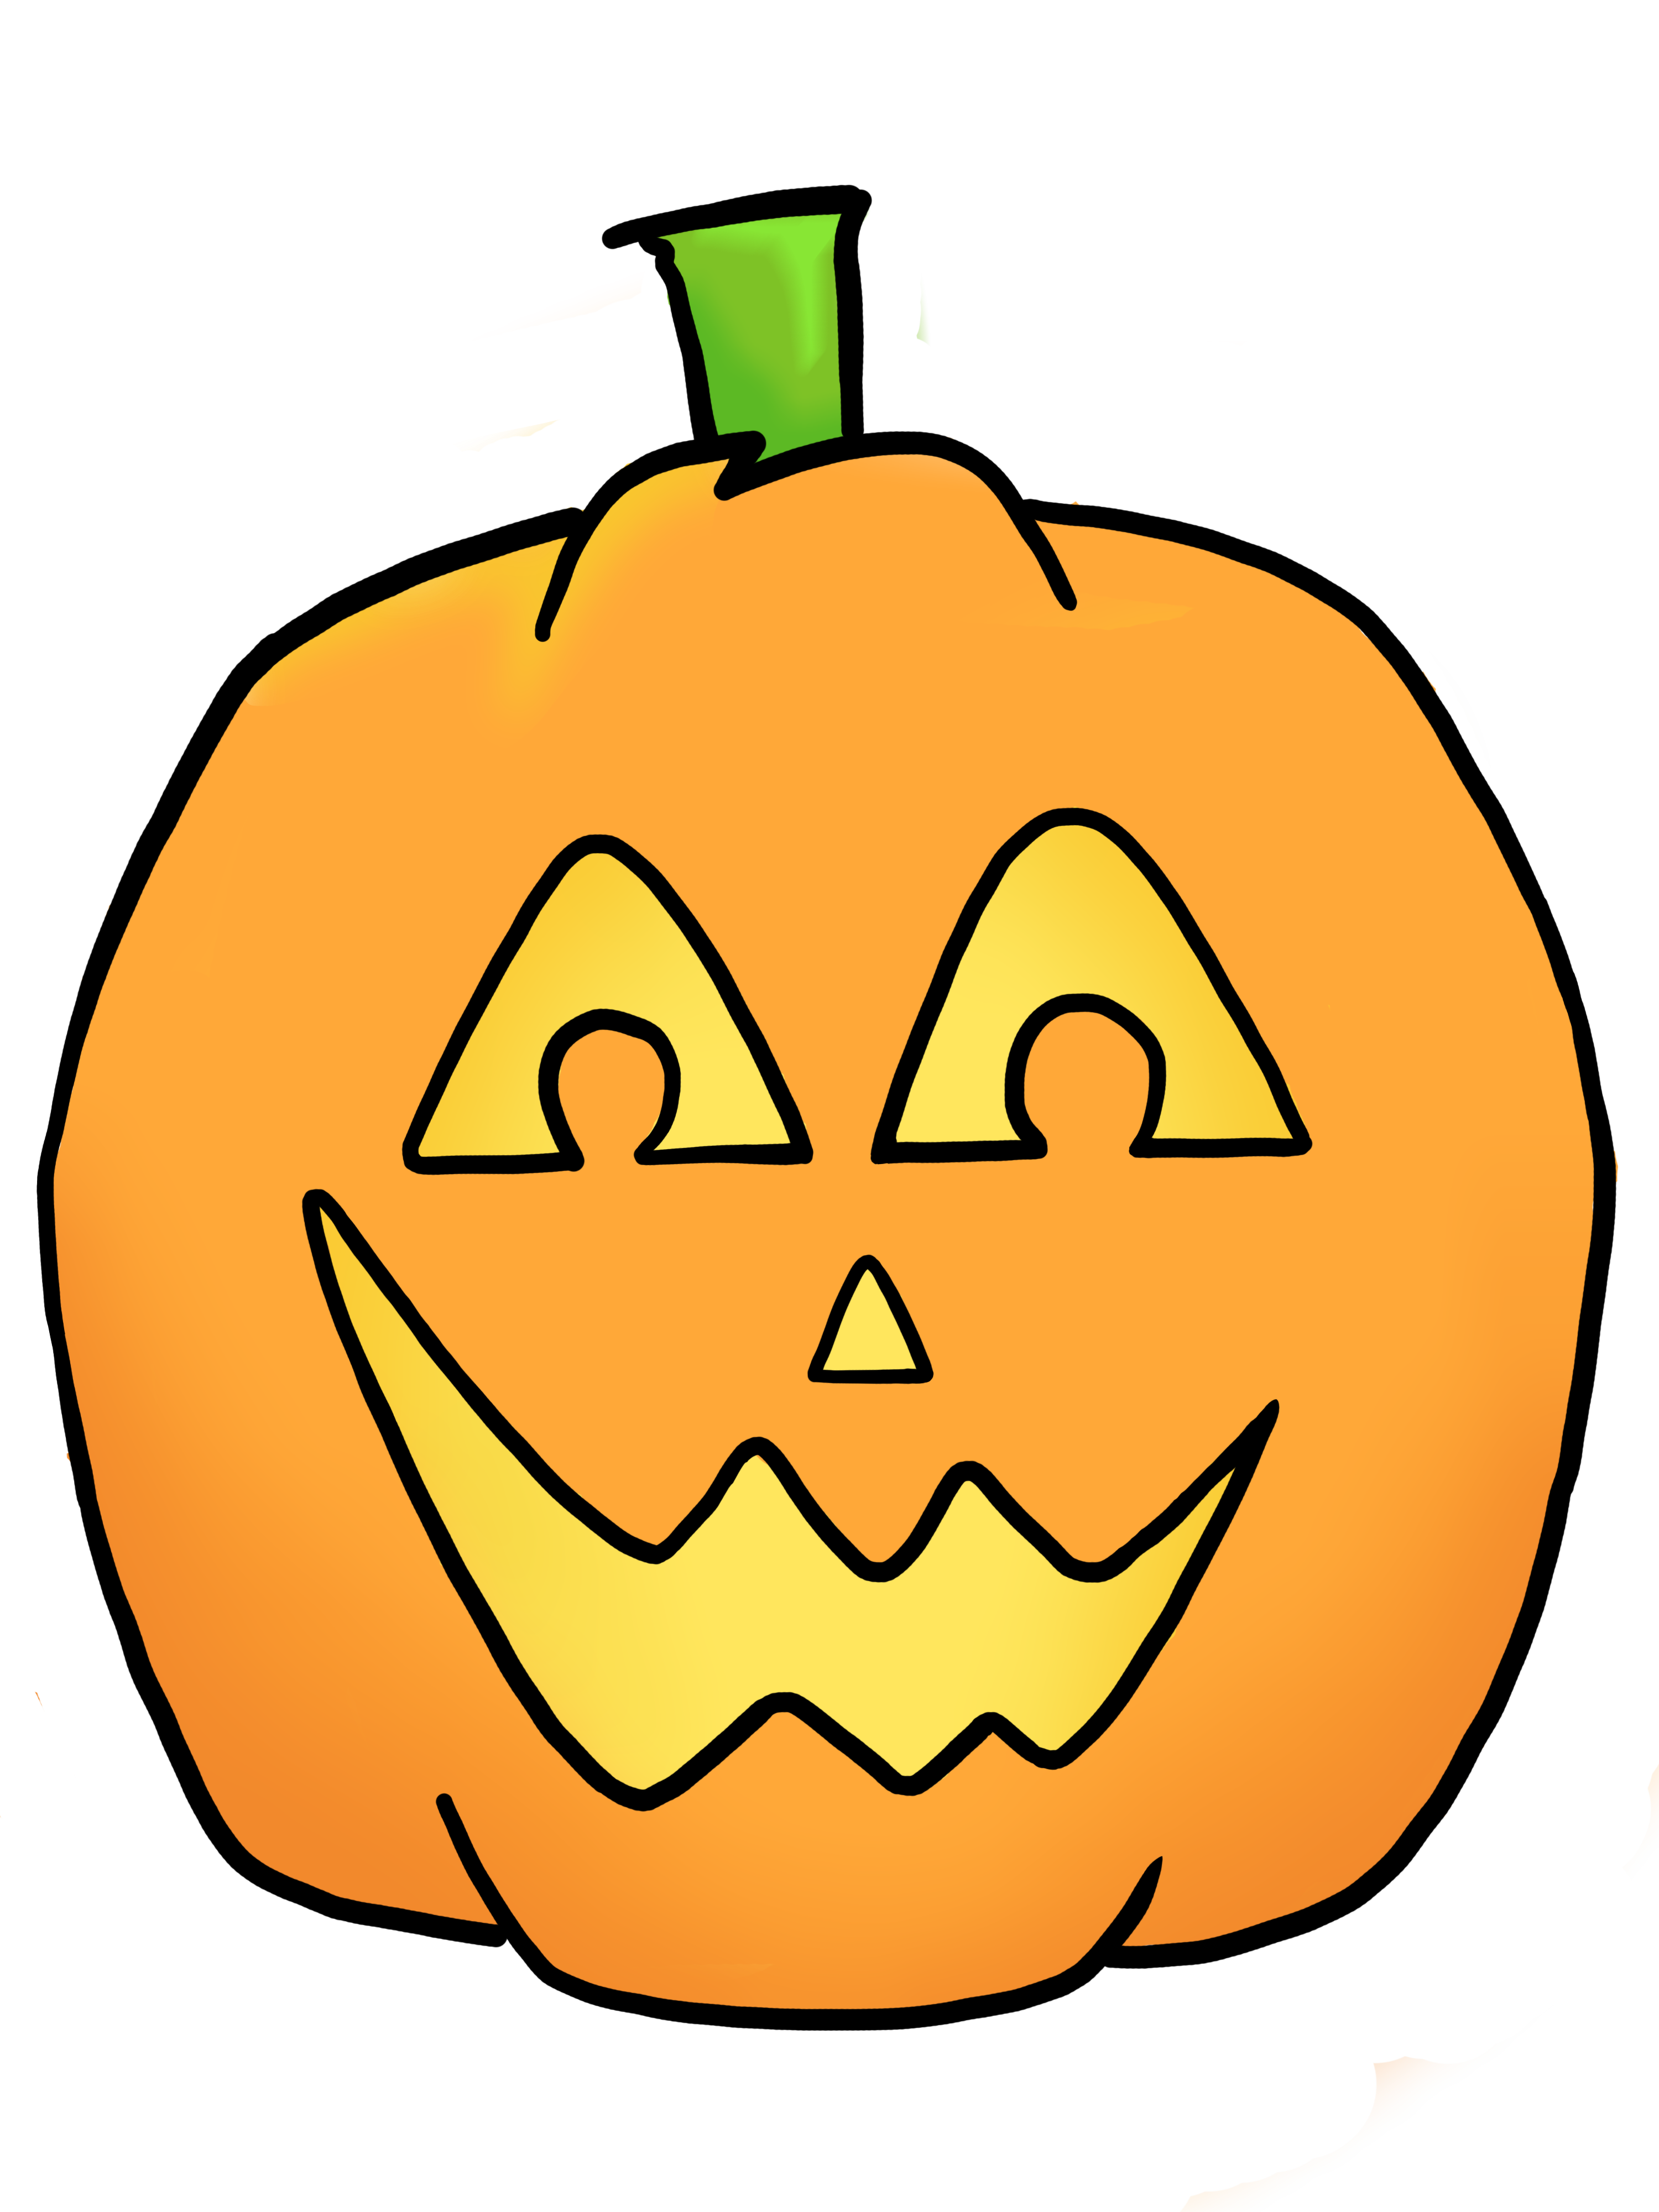 Jack-o'-lantern clipart #7, Download drawings